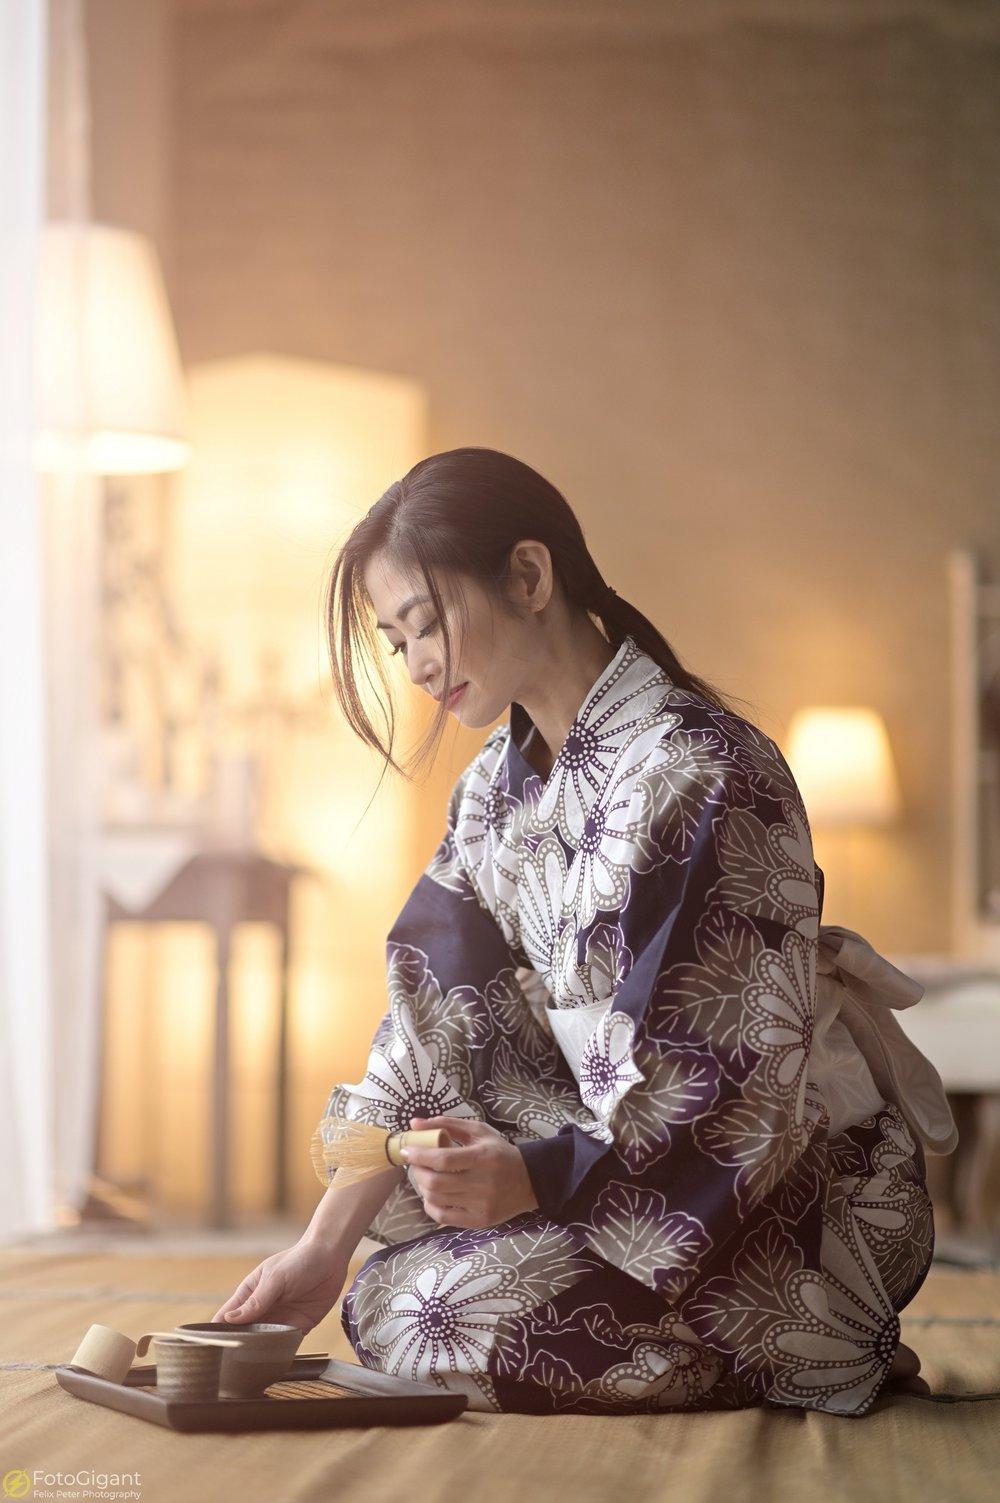 Japanese_Tea_Ceremony_03.jpg